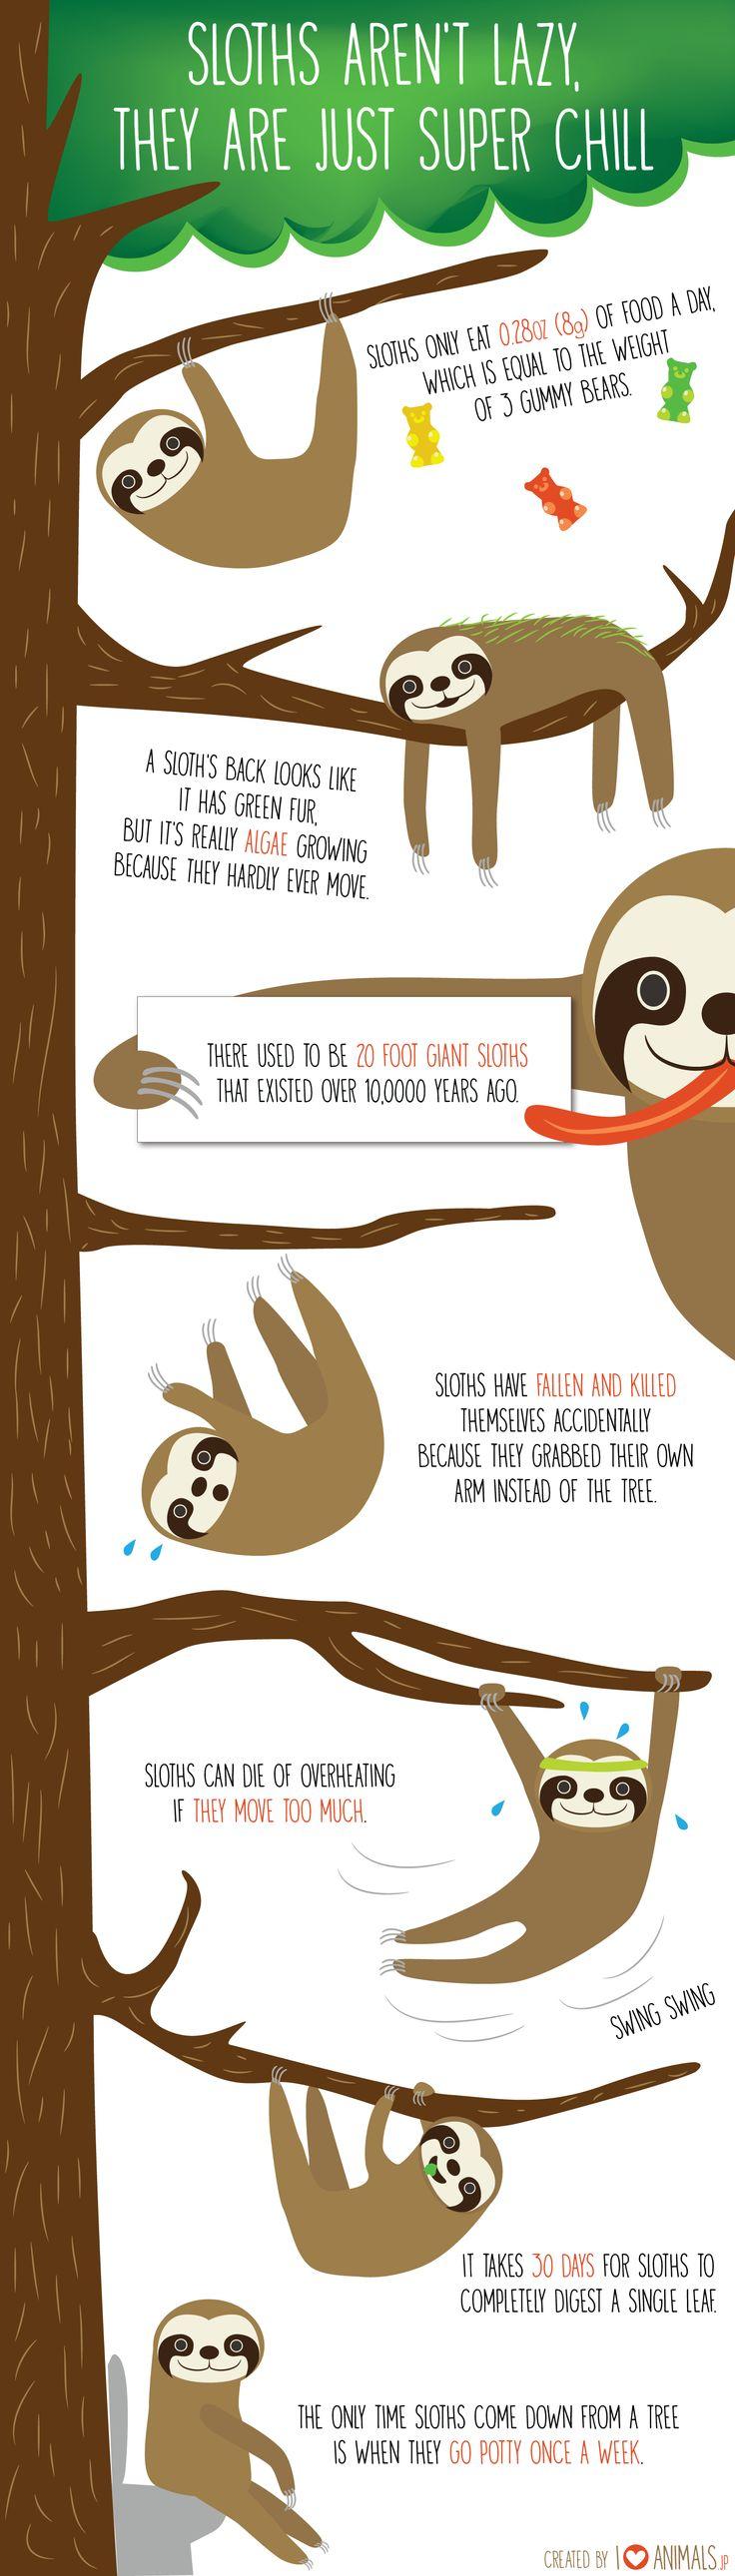 http://iloveanimals.jp/sloths/